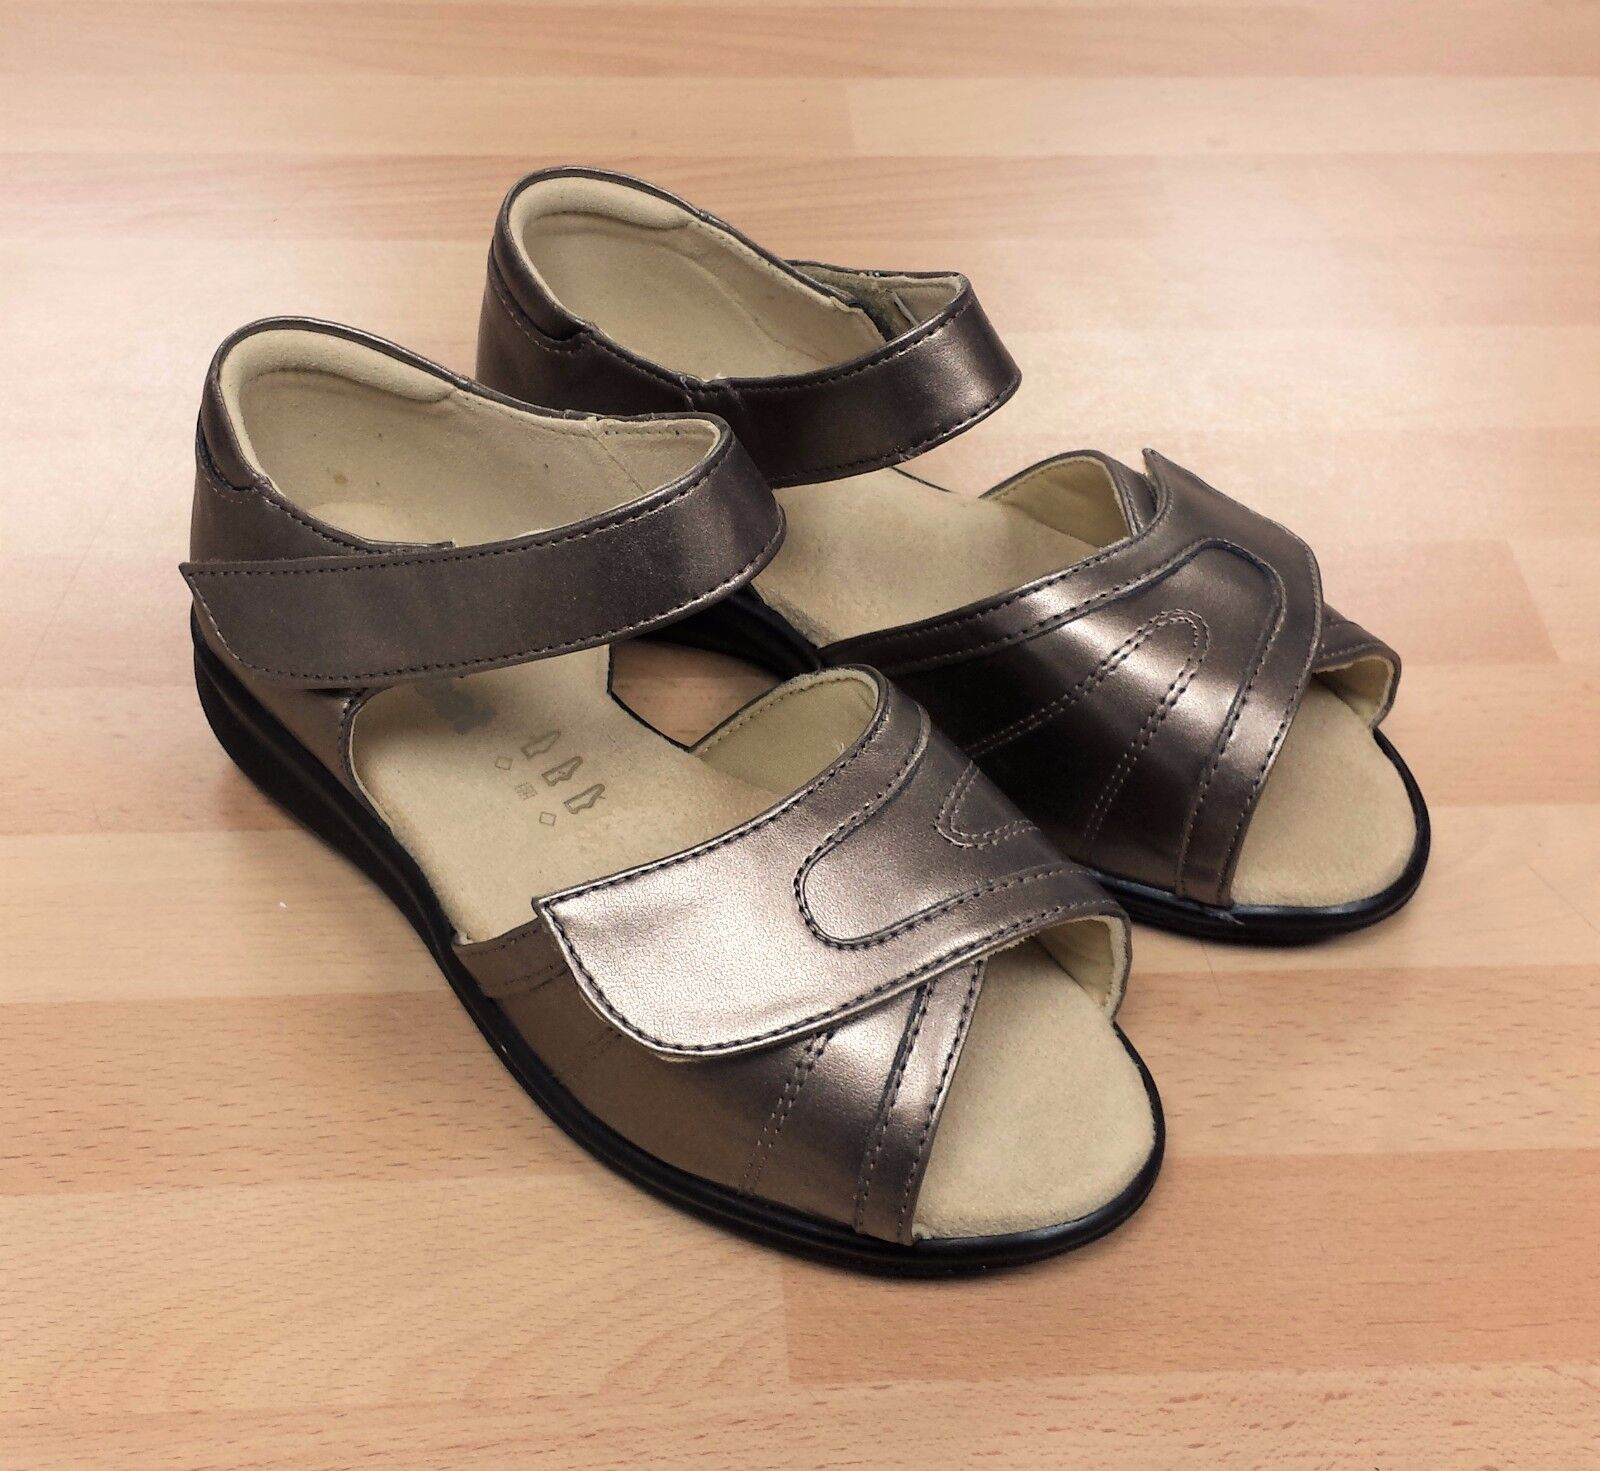 Spacieux Femmes Extra Cosyfeet Bronze Sandales Chaussures SMqzVpLUjG